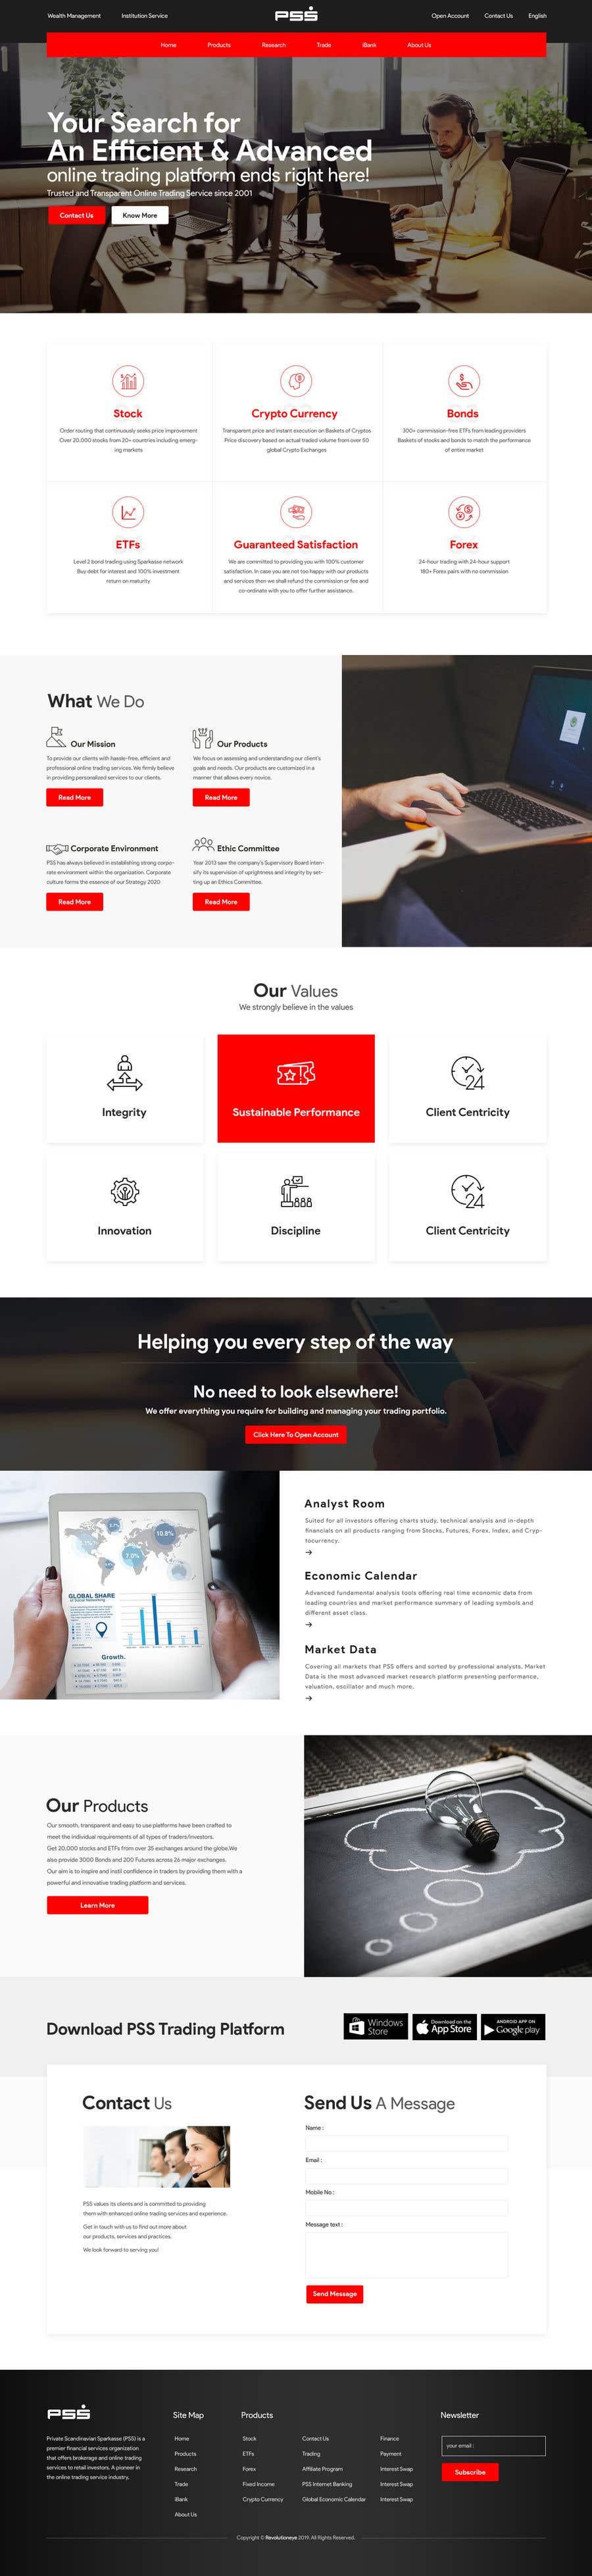 "Intrarea #16 pentru concursul ""Home page design for existing site"""